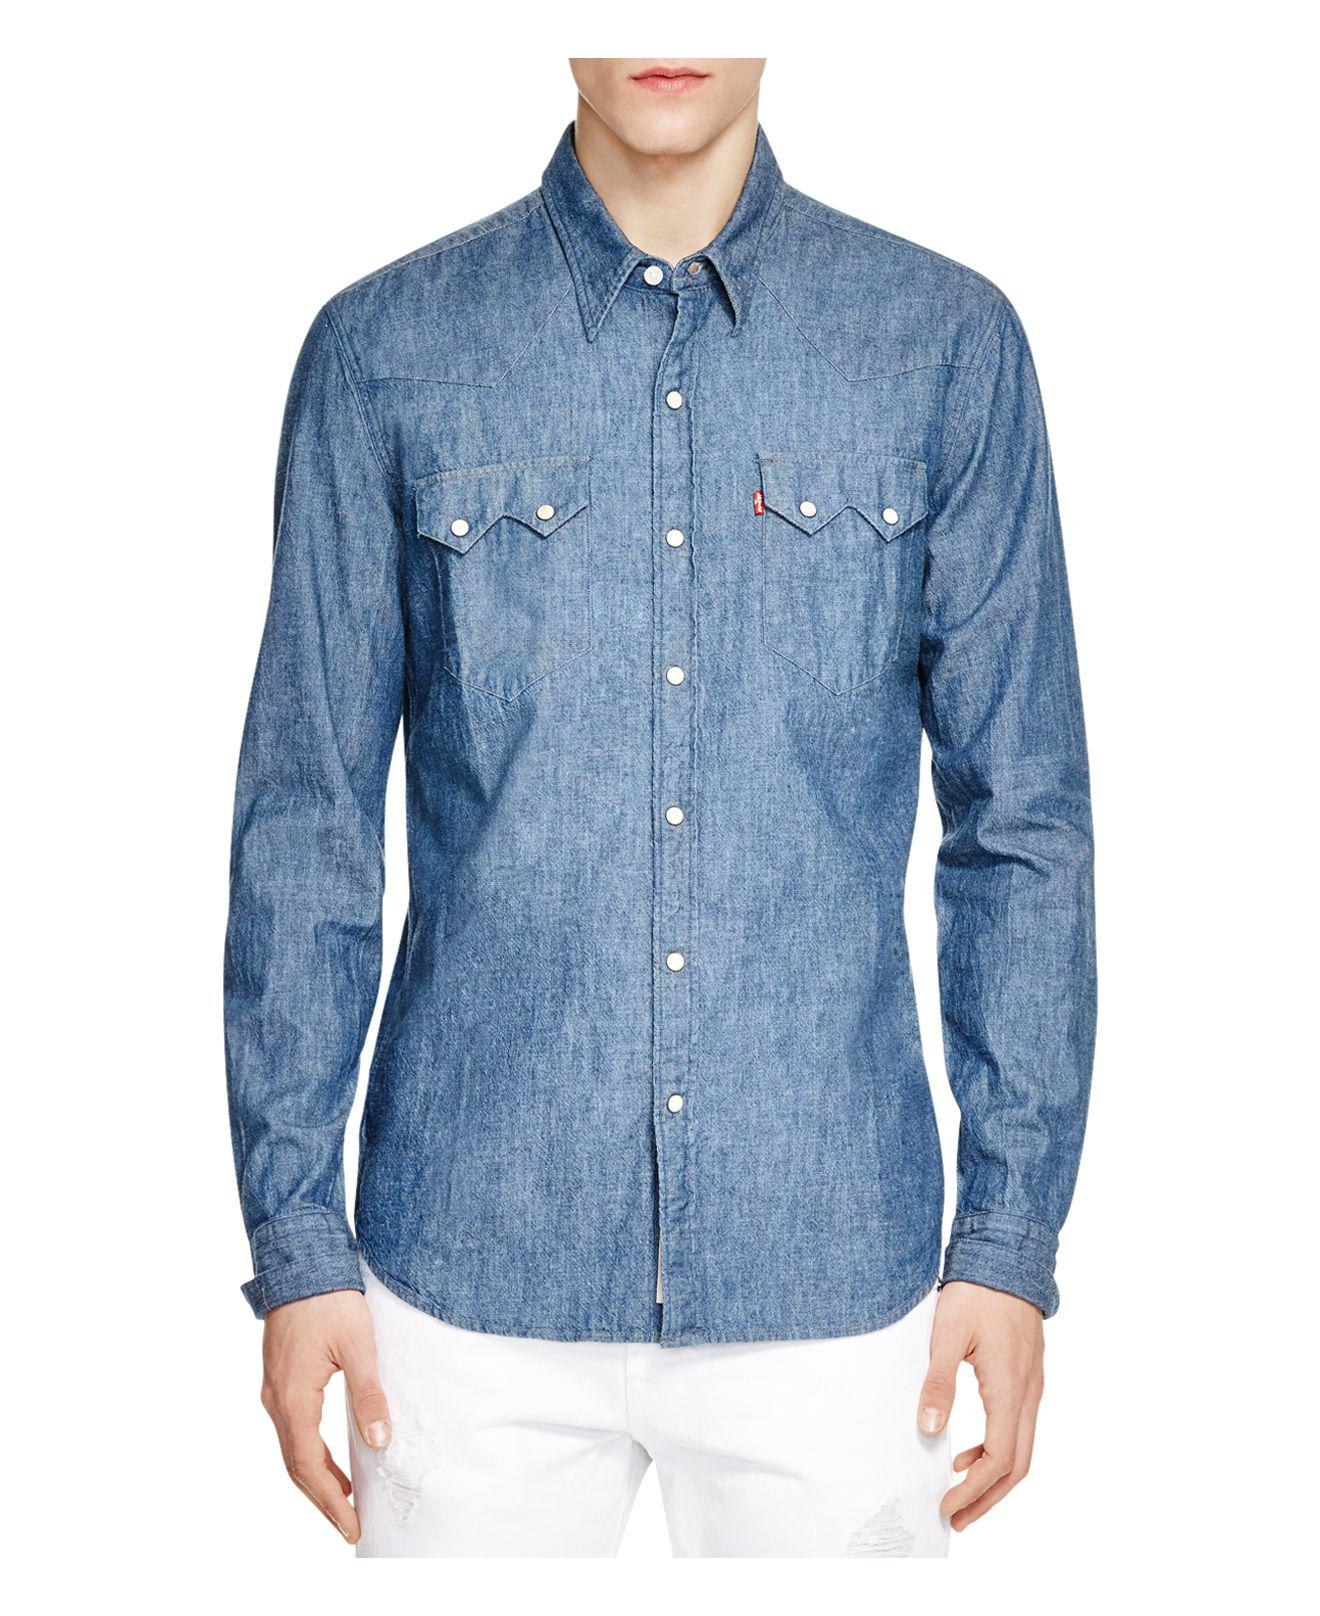 5f26522e9a Lyst - Levi s 1955 Sawtooth Selvedge Denim Slim Fit Snap Front Shirt ...